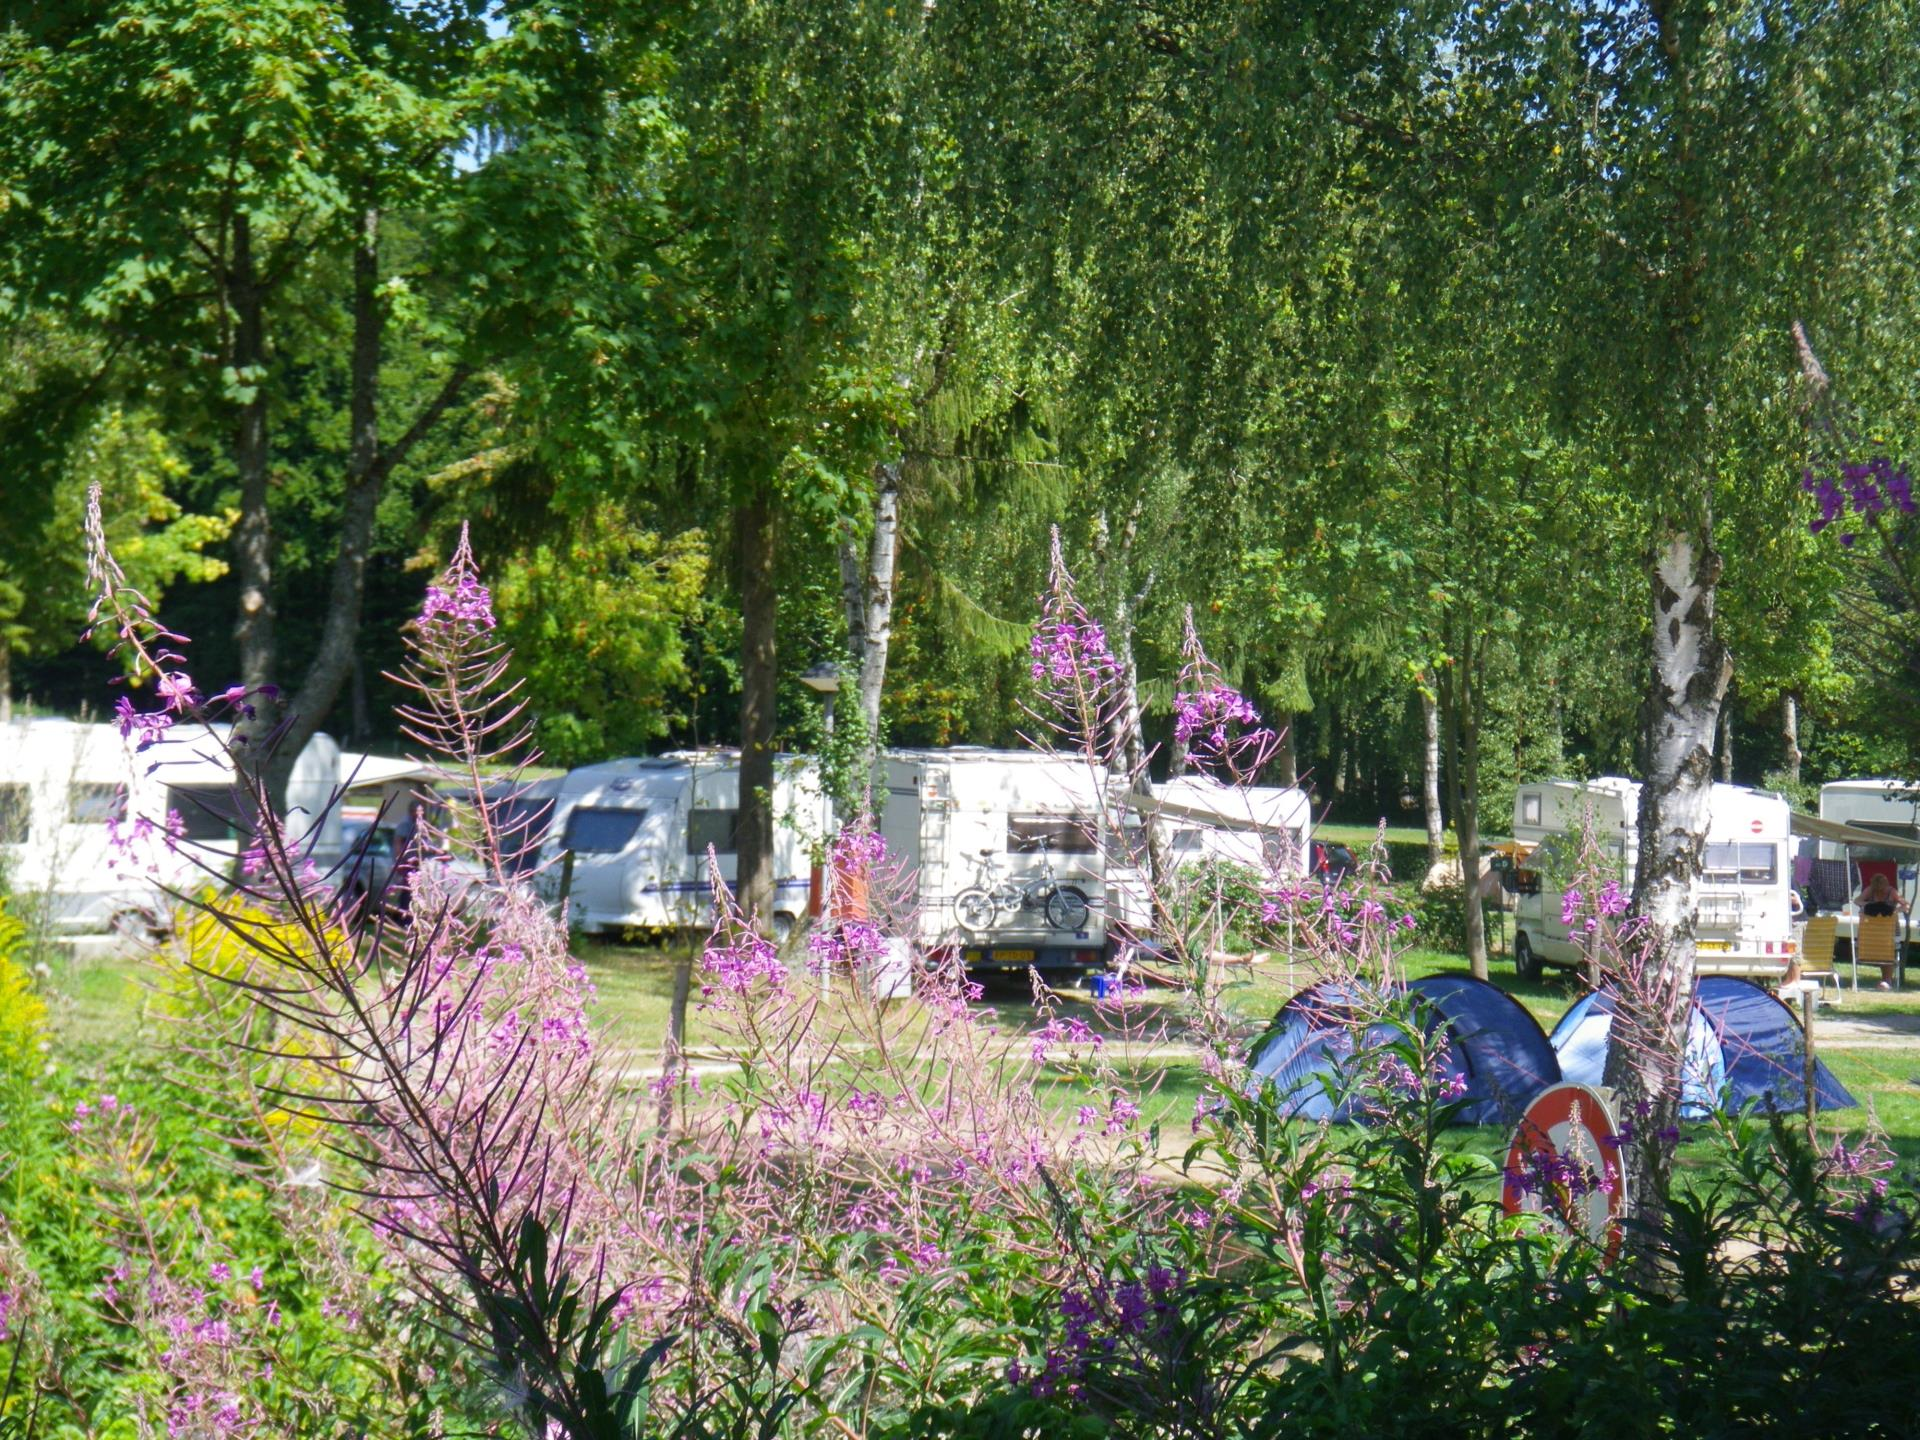 Emplacement - Emplacement (Caravane/Tente/Auto) - Camping auf Kengert